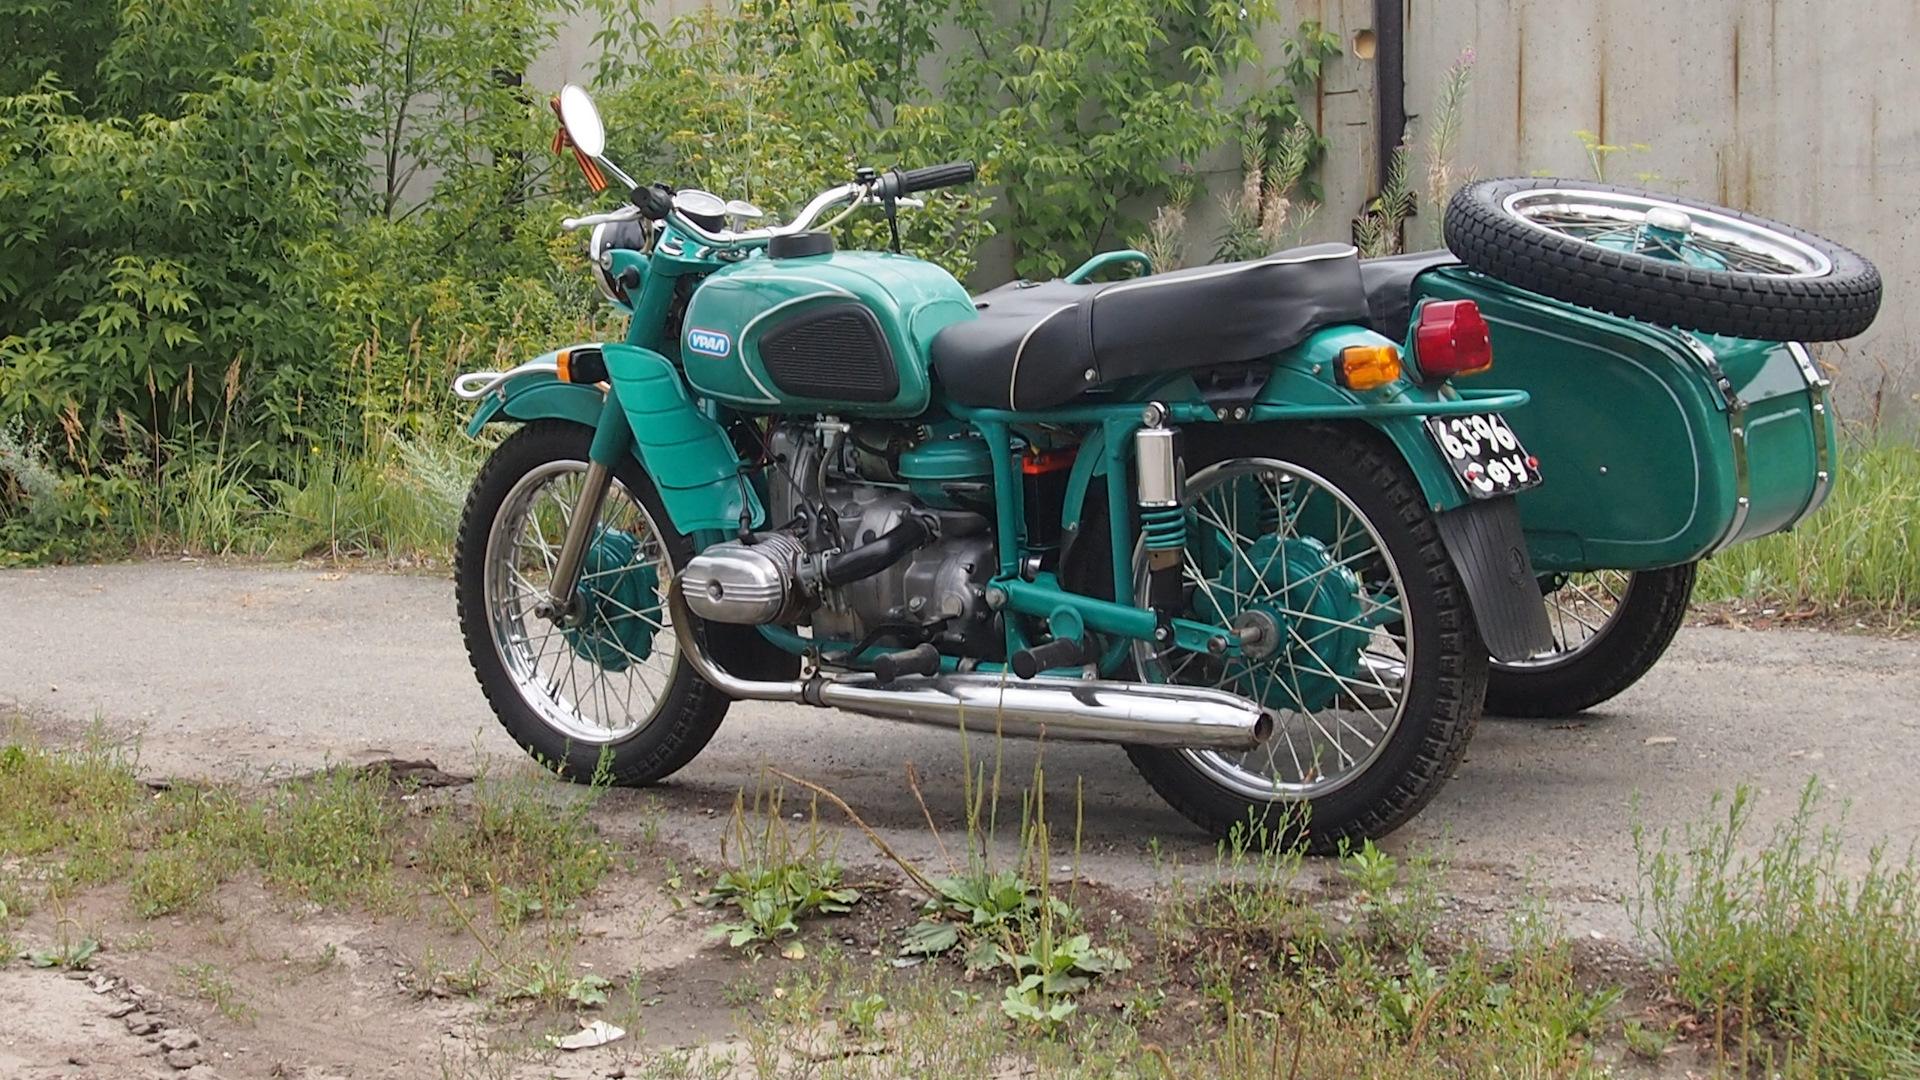 картинки про мотоцикл урал многие коллеги, рубик